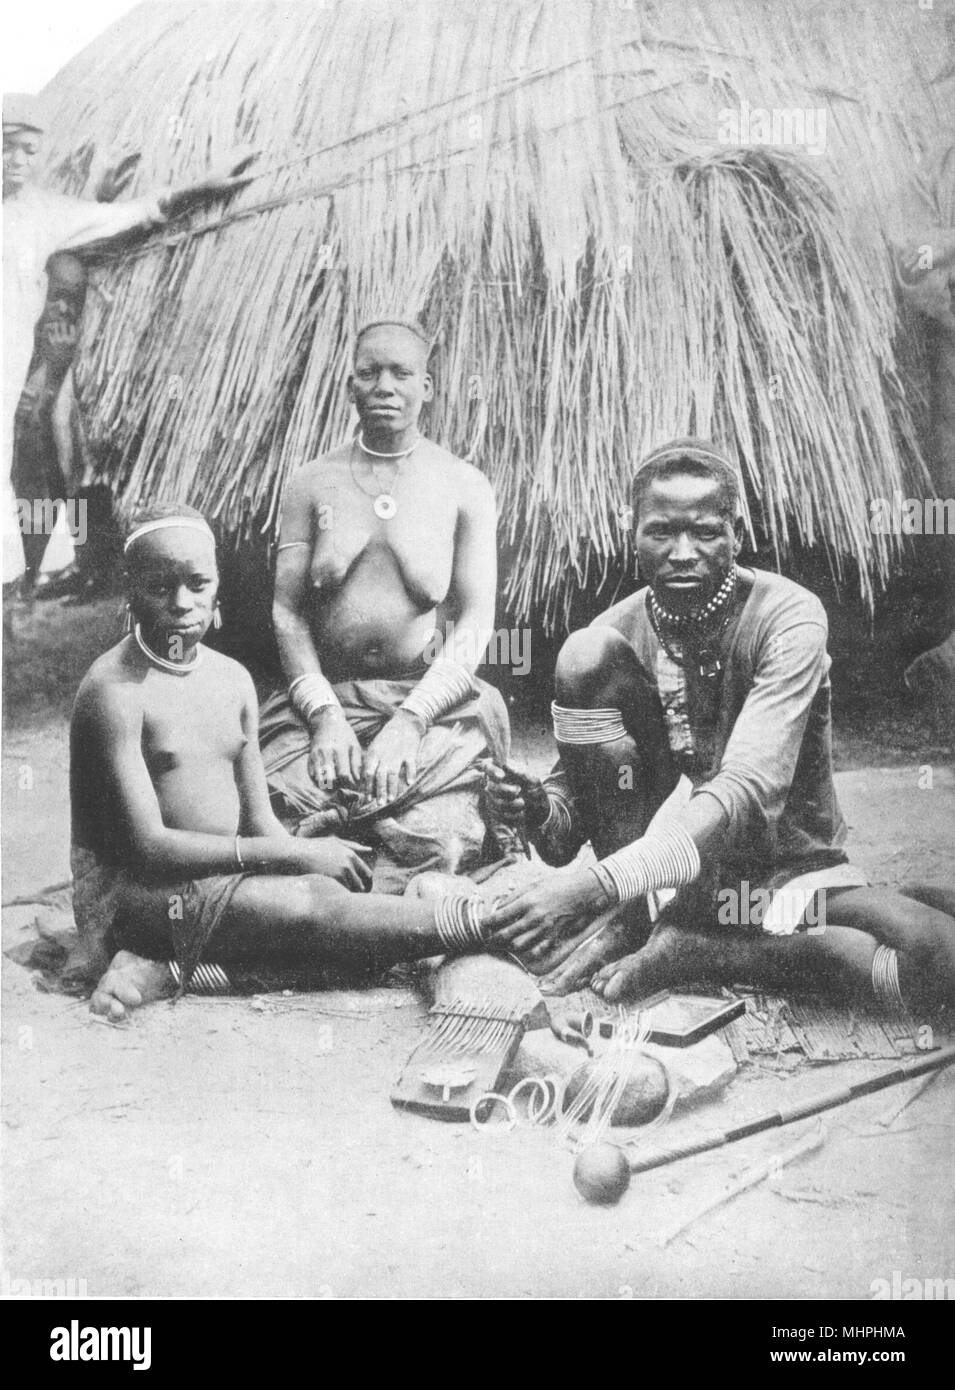 ZIMBABWE. South Africa. Adornment, Rhodesia; Matabele and Mashonas 1900 print - Stock Image